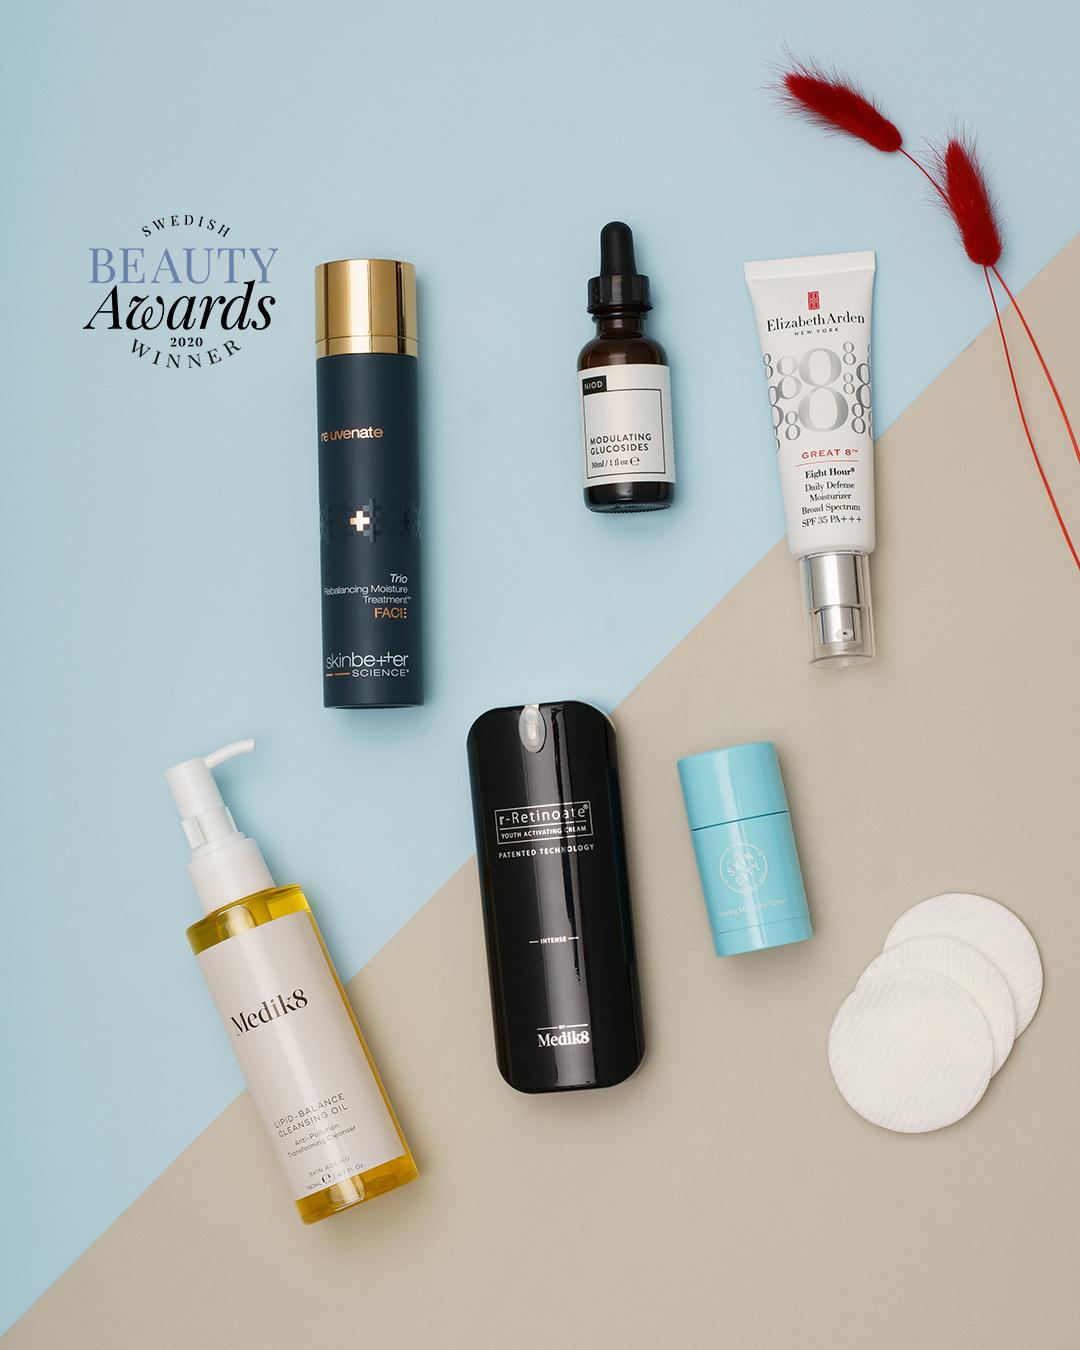 Vass-Kommunikation-Swedish-Beauty-Awards-2020-samlingsbild-1080x1350-ny